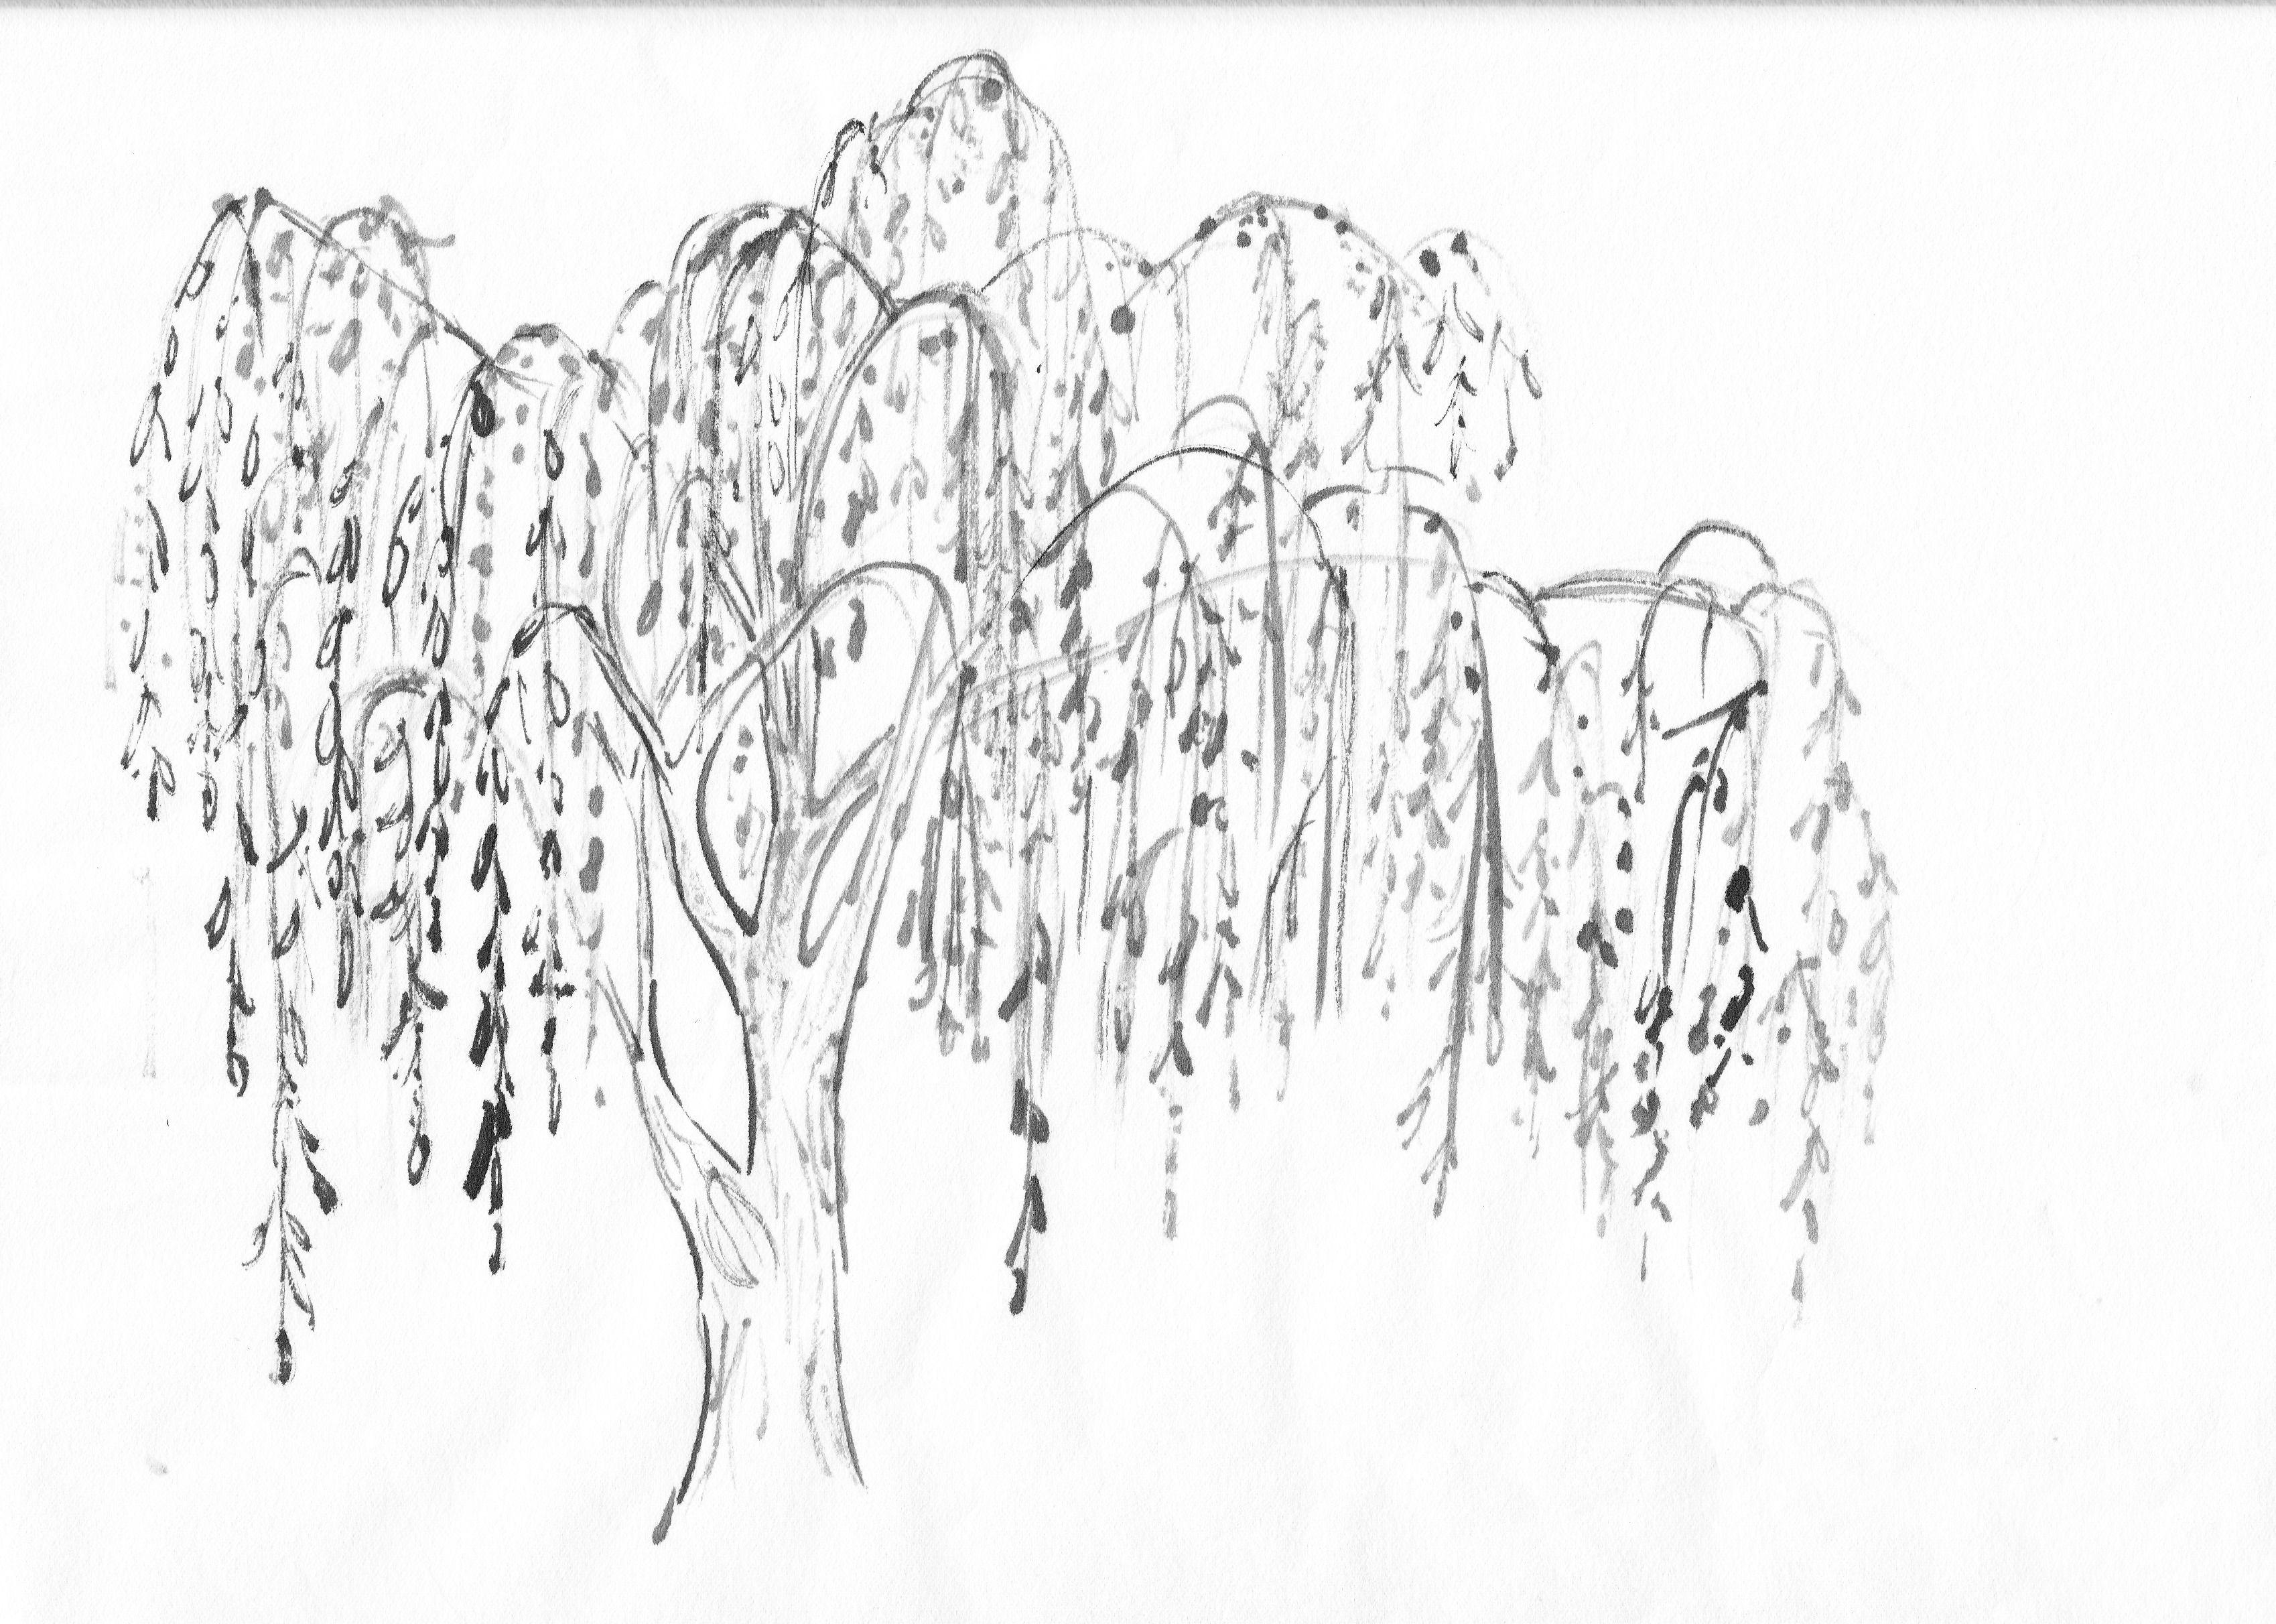 willow tree clipart [ 3397 x 2424 Pixel ]